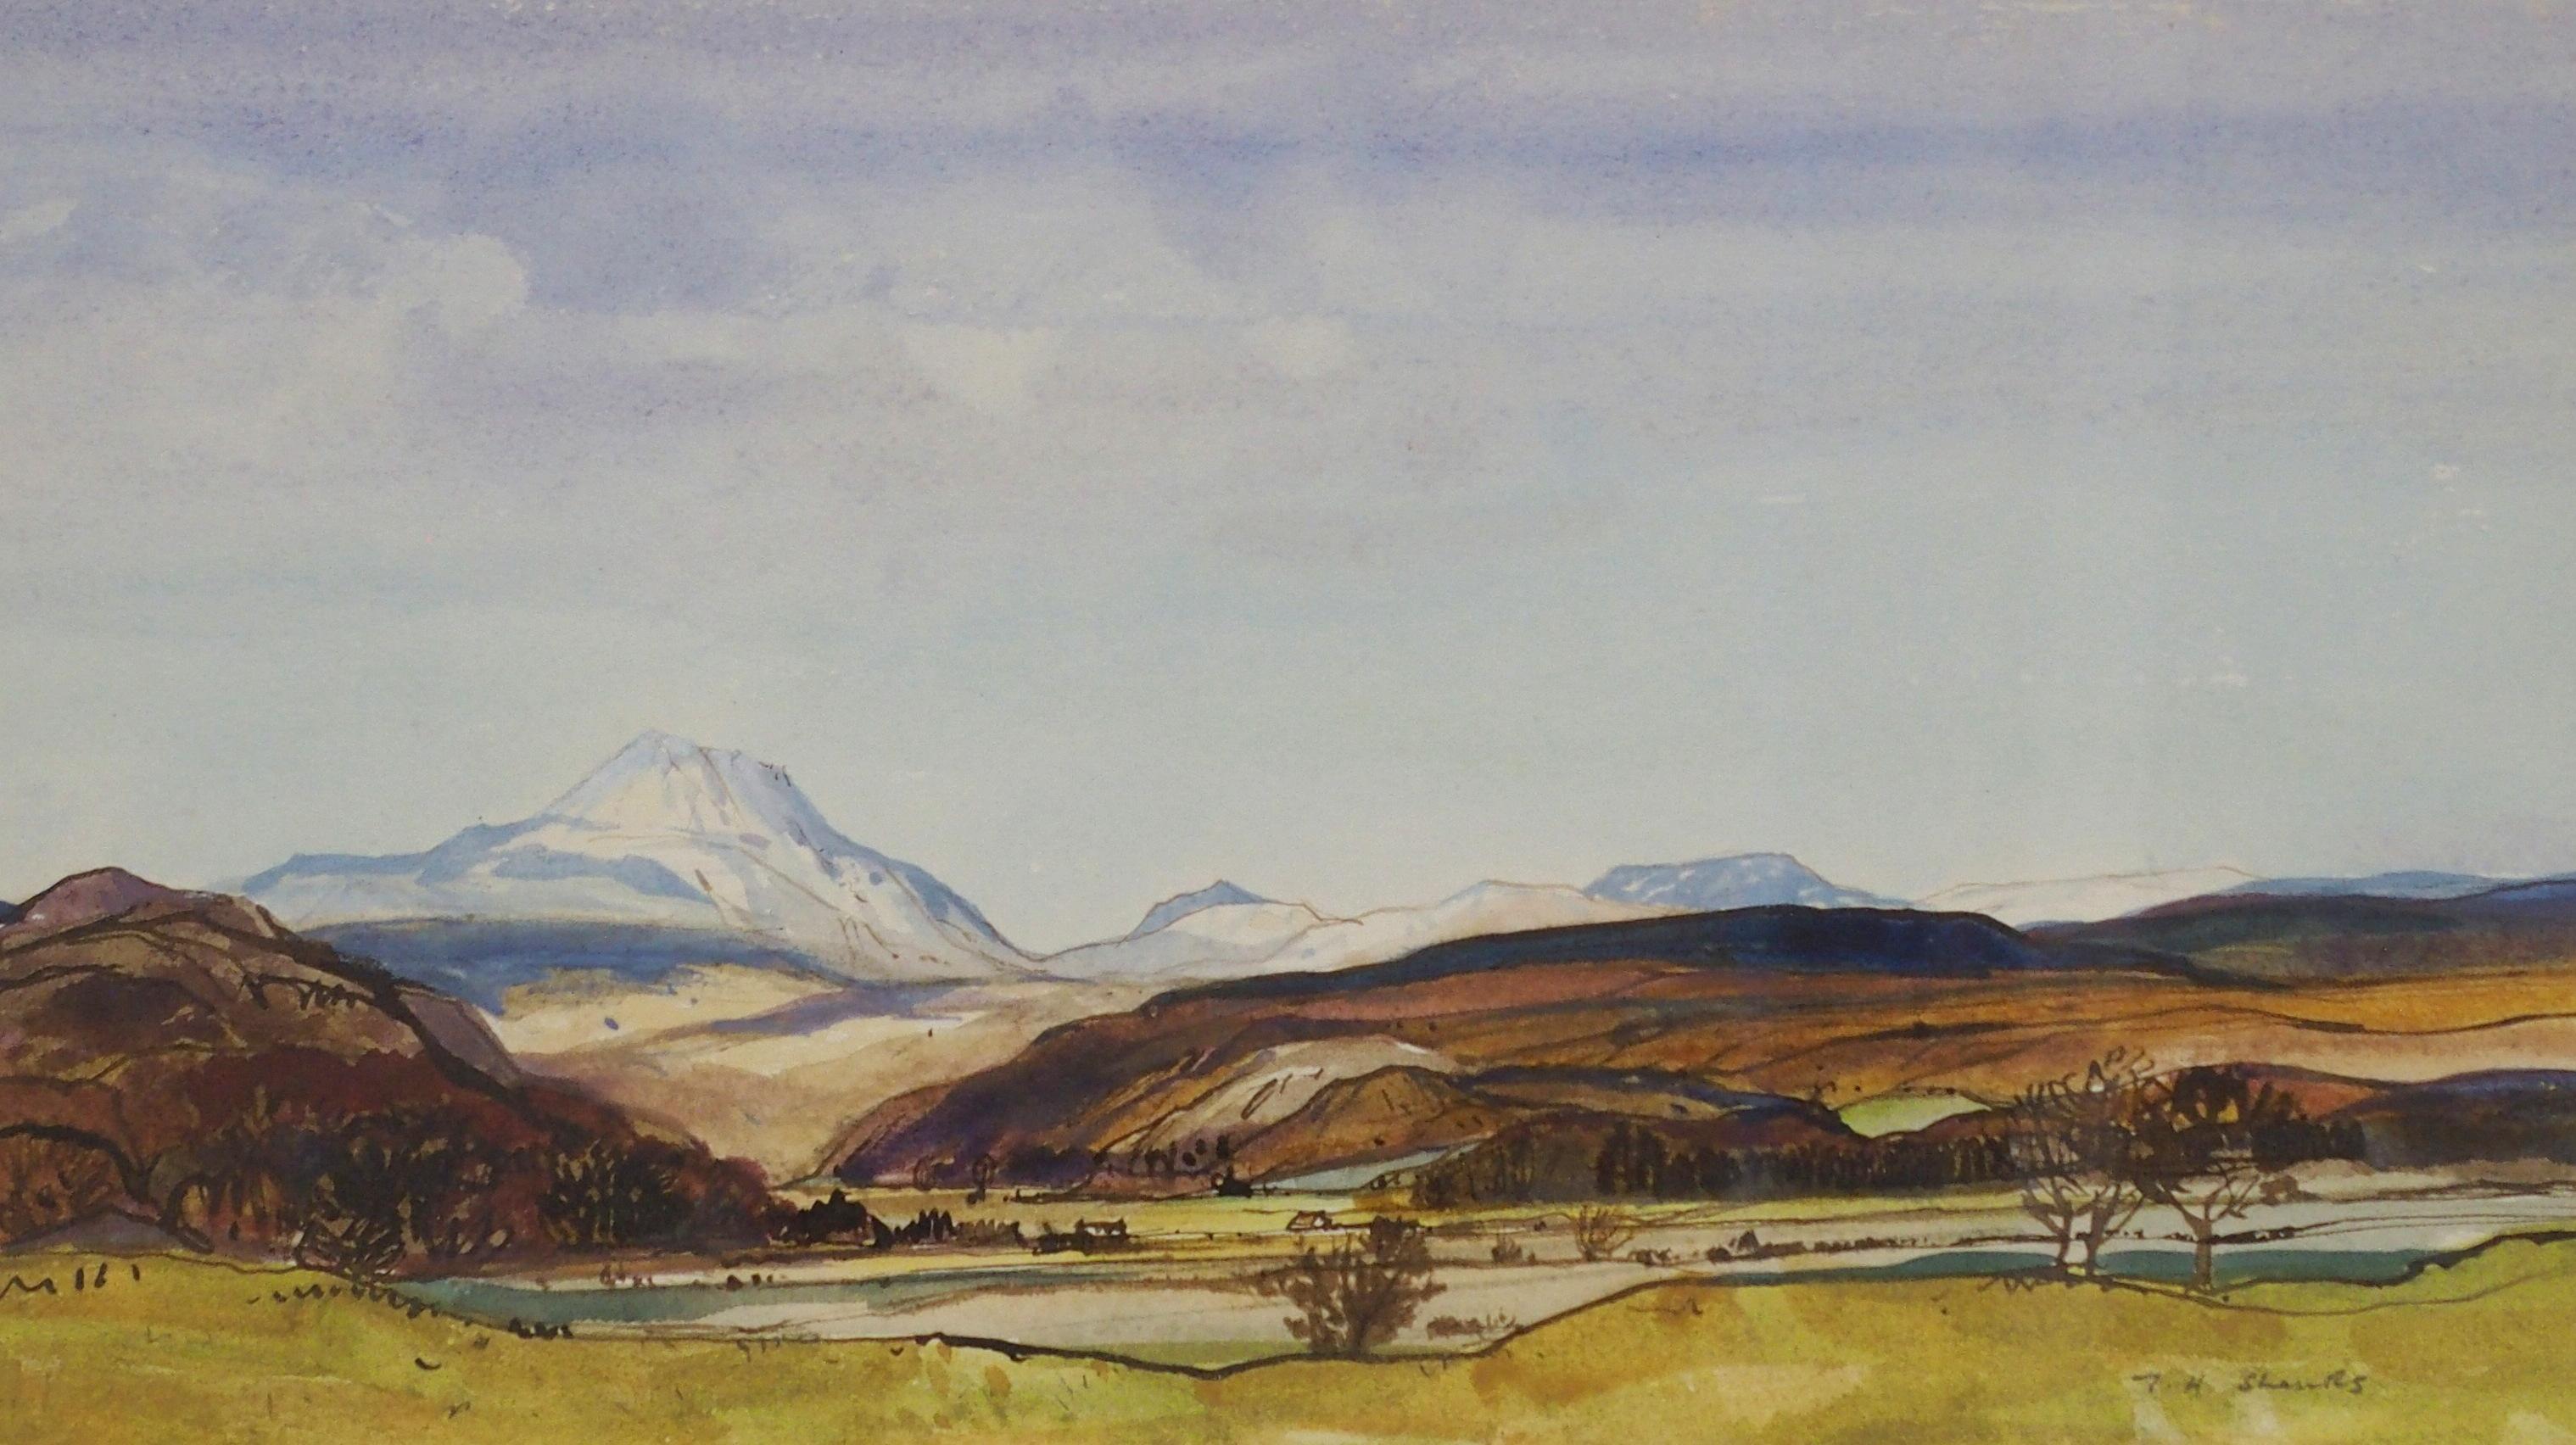 •TOM H SHANKS RSW, RGI (1921-1920) NEAR BALFRON Watercolour on paper, signed, 20 x 35cm (8 x 13 3/